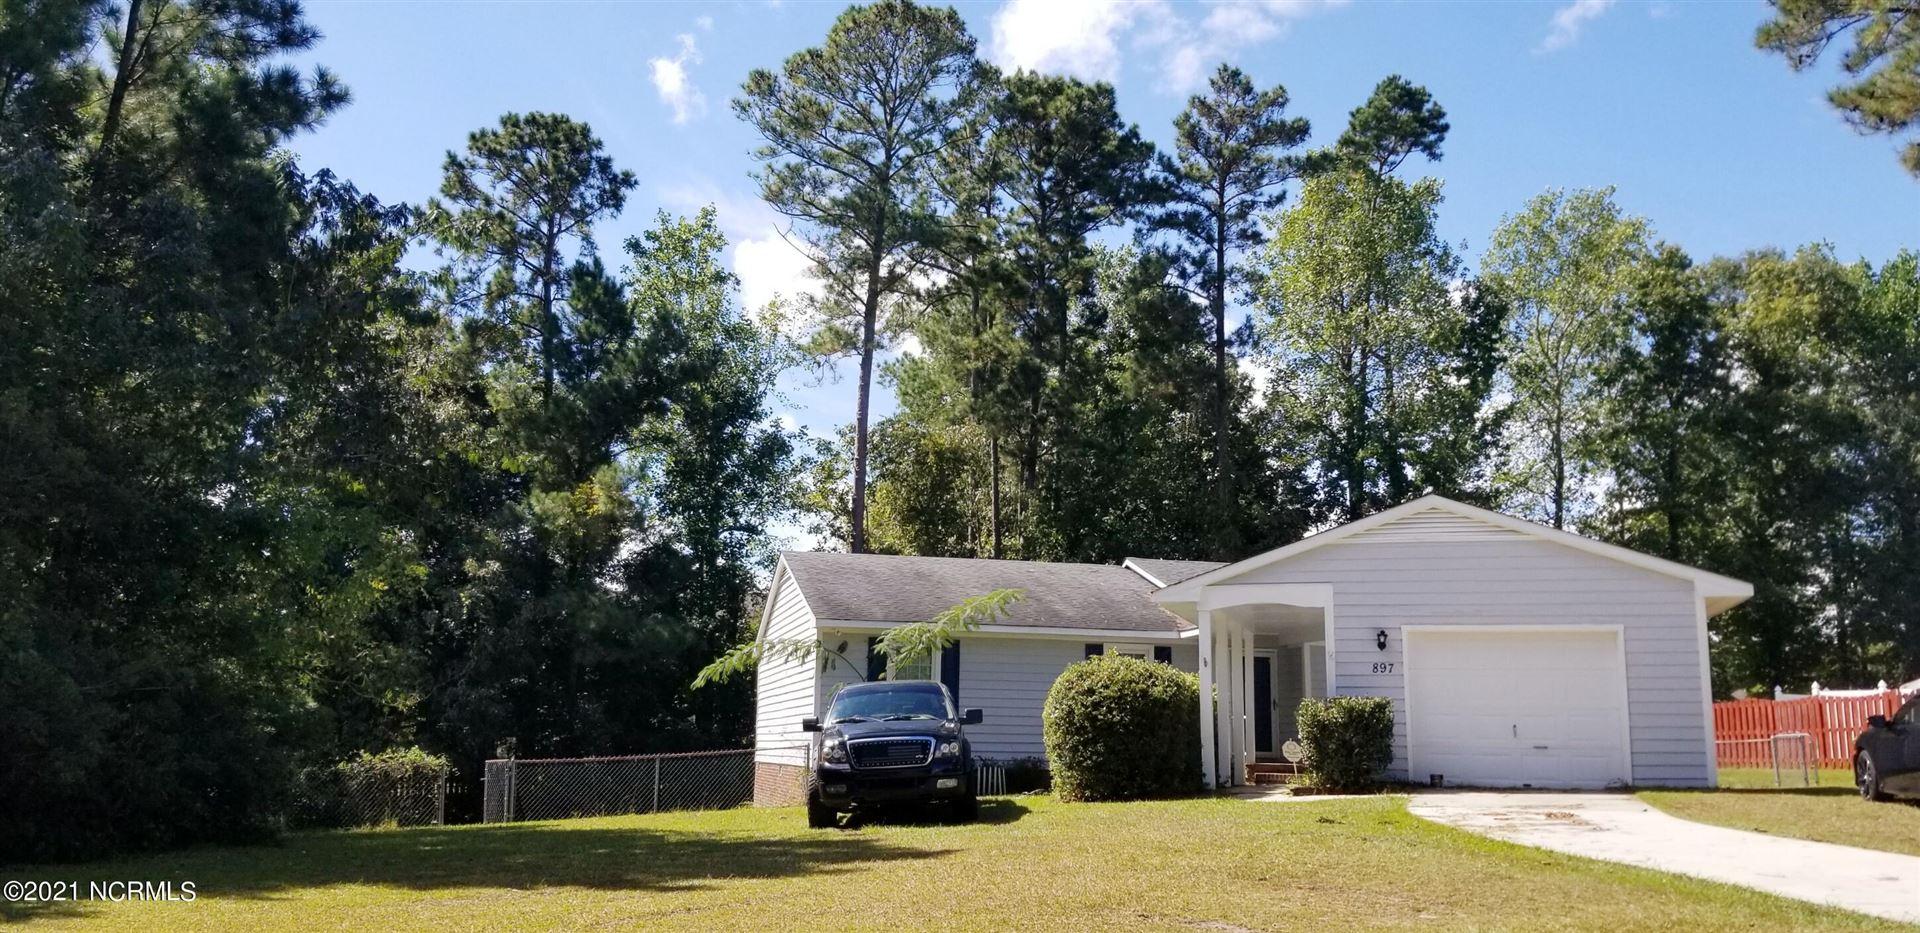 Photo of 897 Pine Valley Road, Jacksonville, NC 28546 (MLS # 100293946)